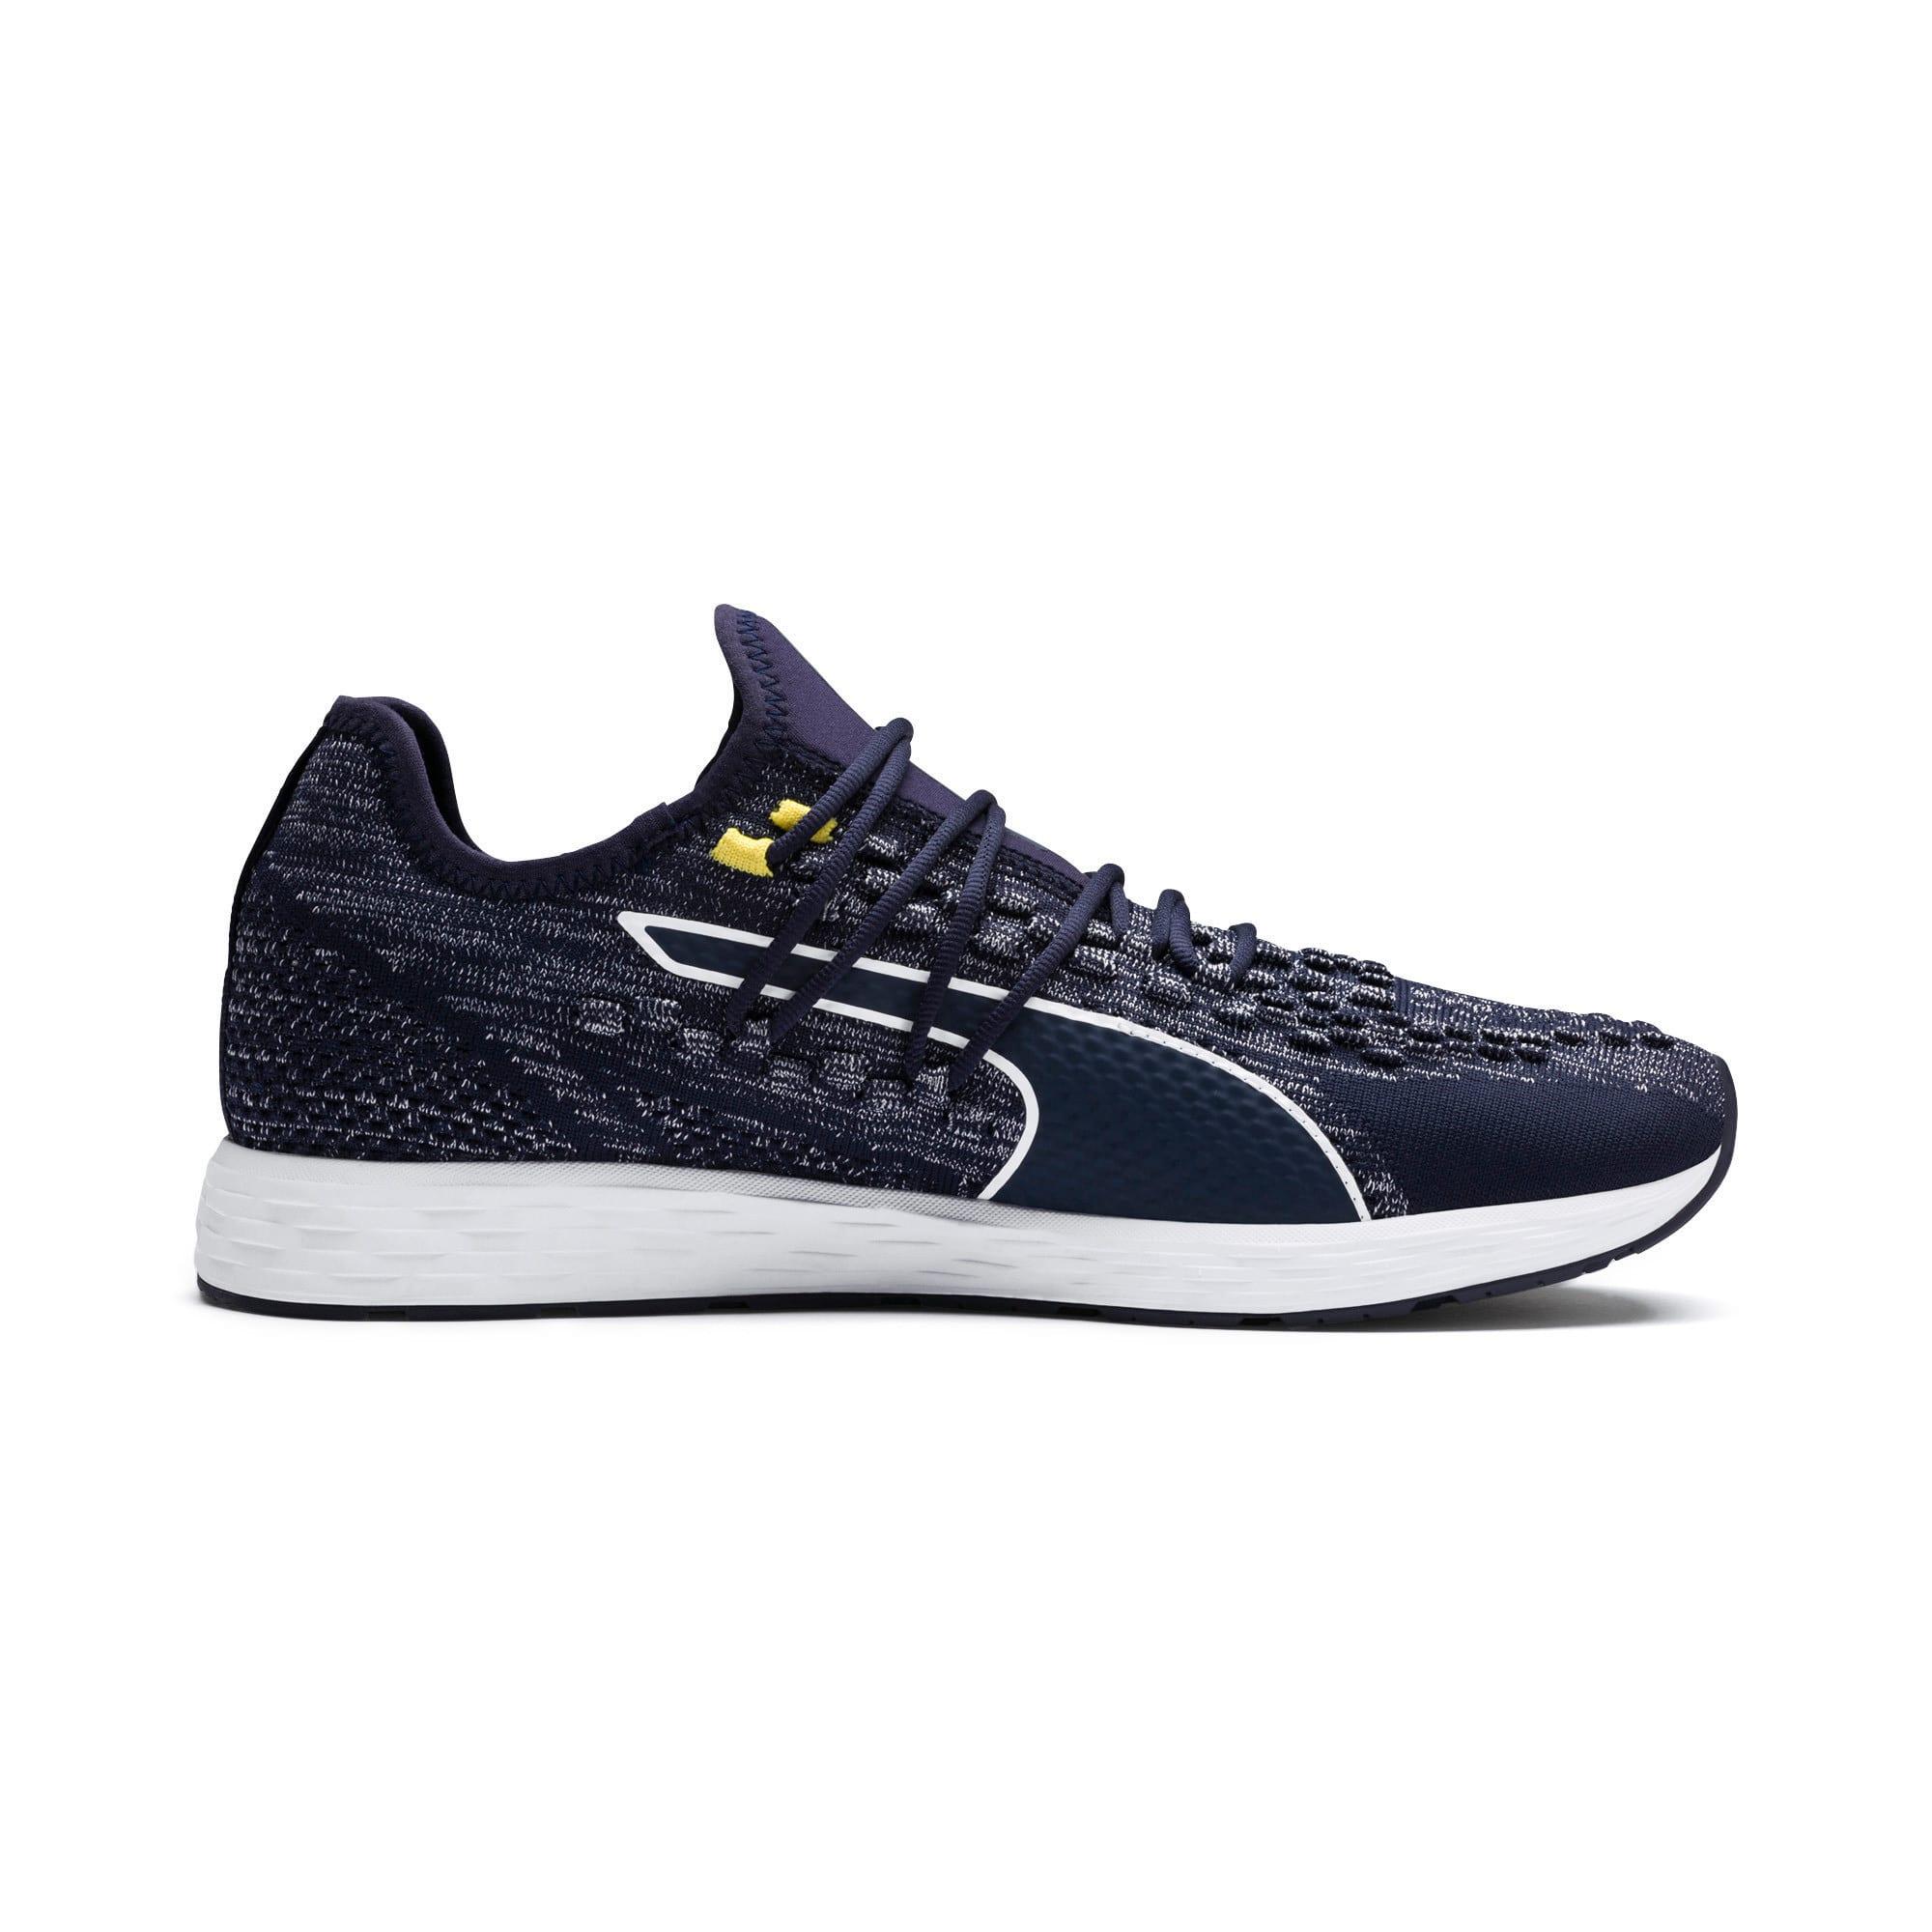 Thumbnail 5 of SPEED RACER Men's Running Shoes, Peacoat-White-Blazing Yellow, medium-IND